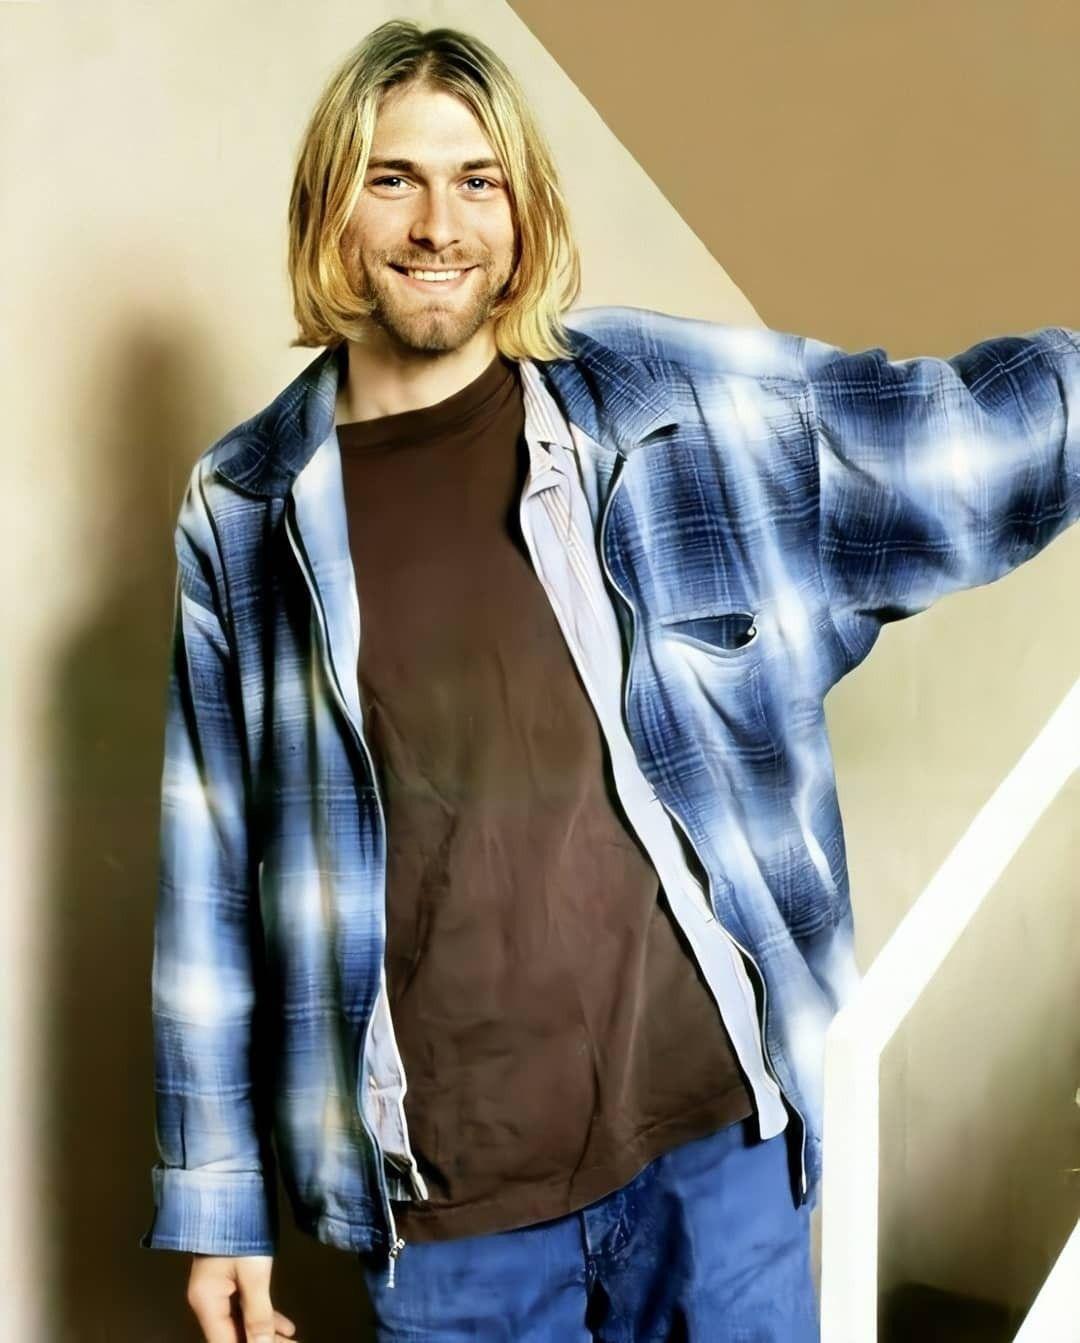 Pin By Velvet On Kurt Cobain Kurt Cobain Fashion Leather Jacket [ 1343 x 1080 Pixel ]